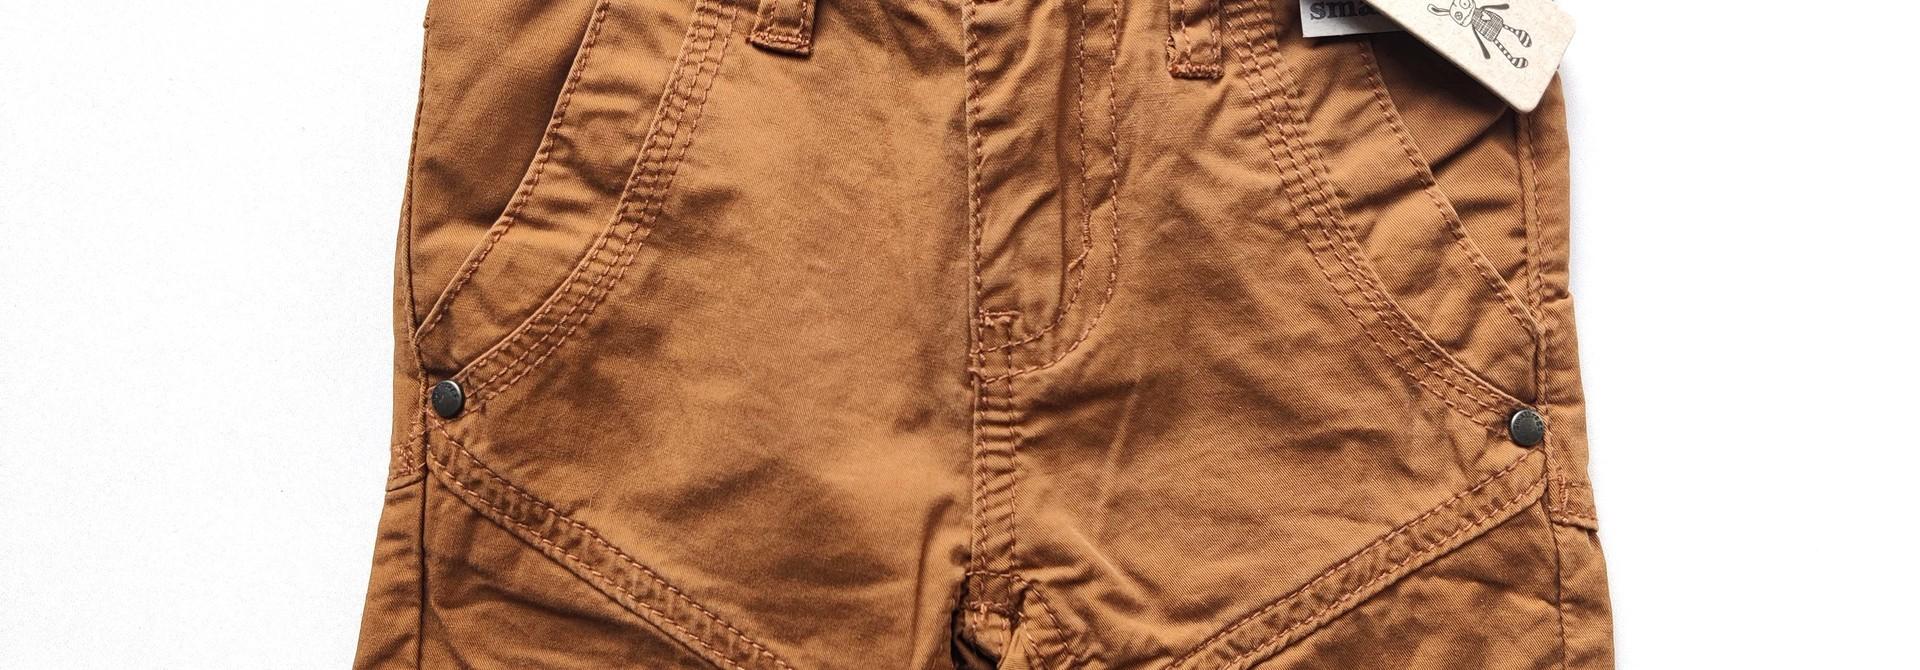 Nieuwe short Small Rags